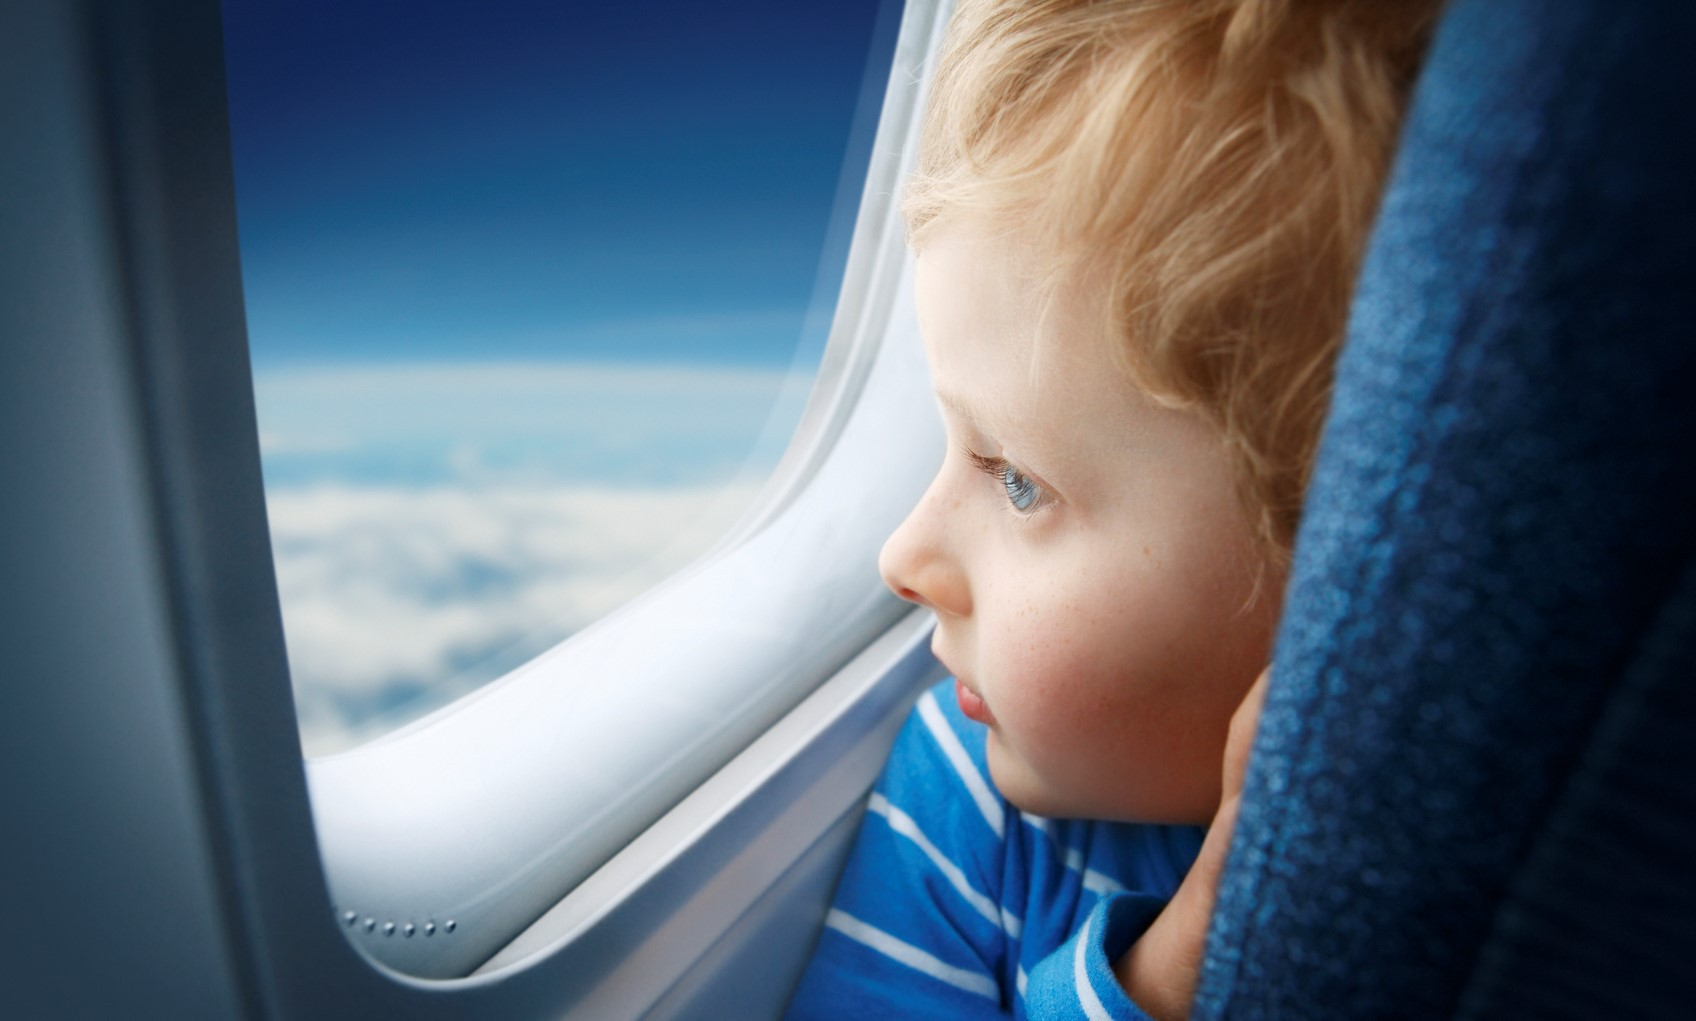 Boy watching sky through the airplane window